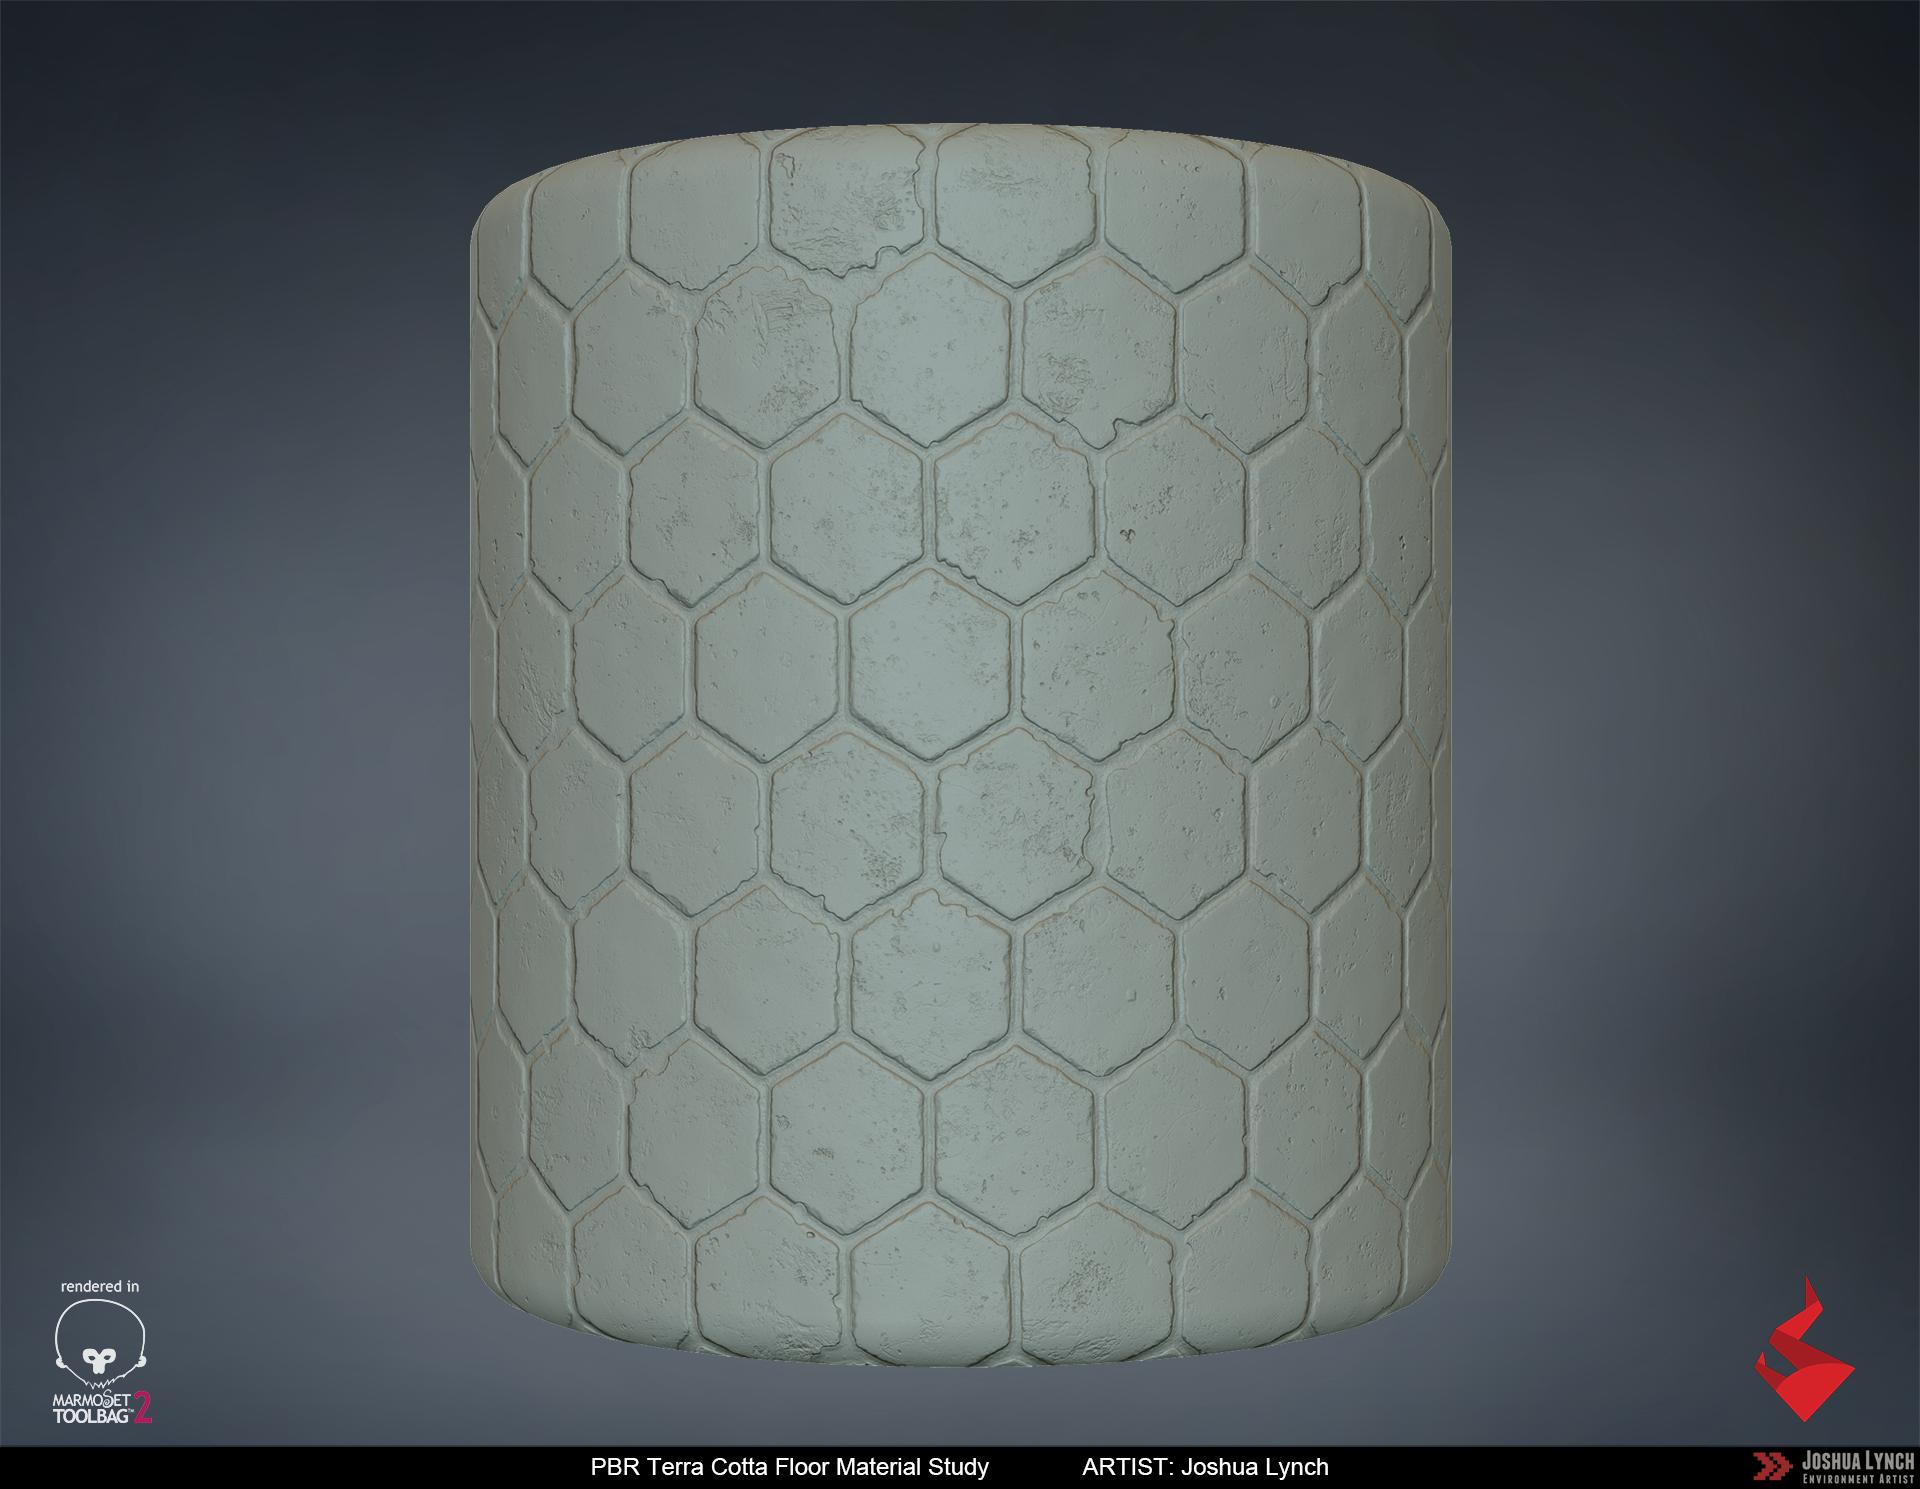 Floor_Terra_Cotta_01_Cylinder_Rev_03_Layout_Comp_Josh_Lynch.png